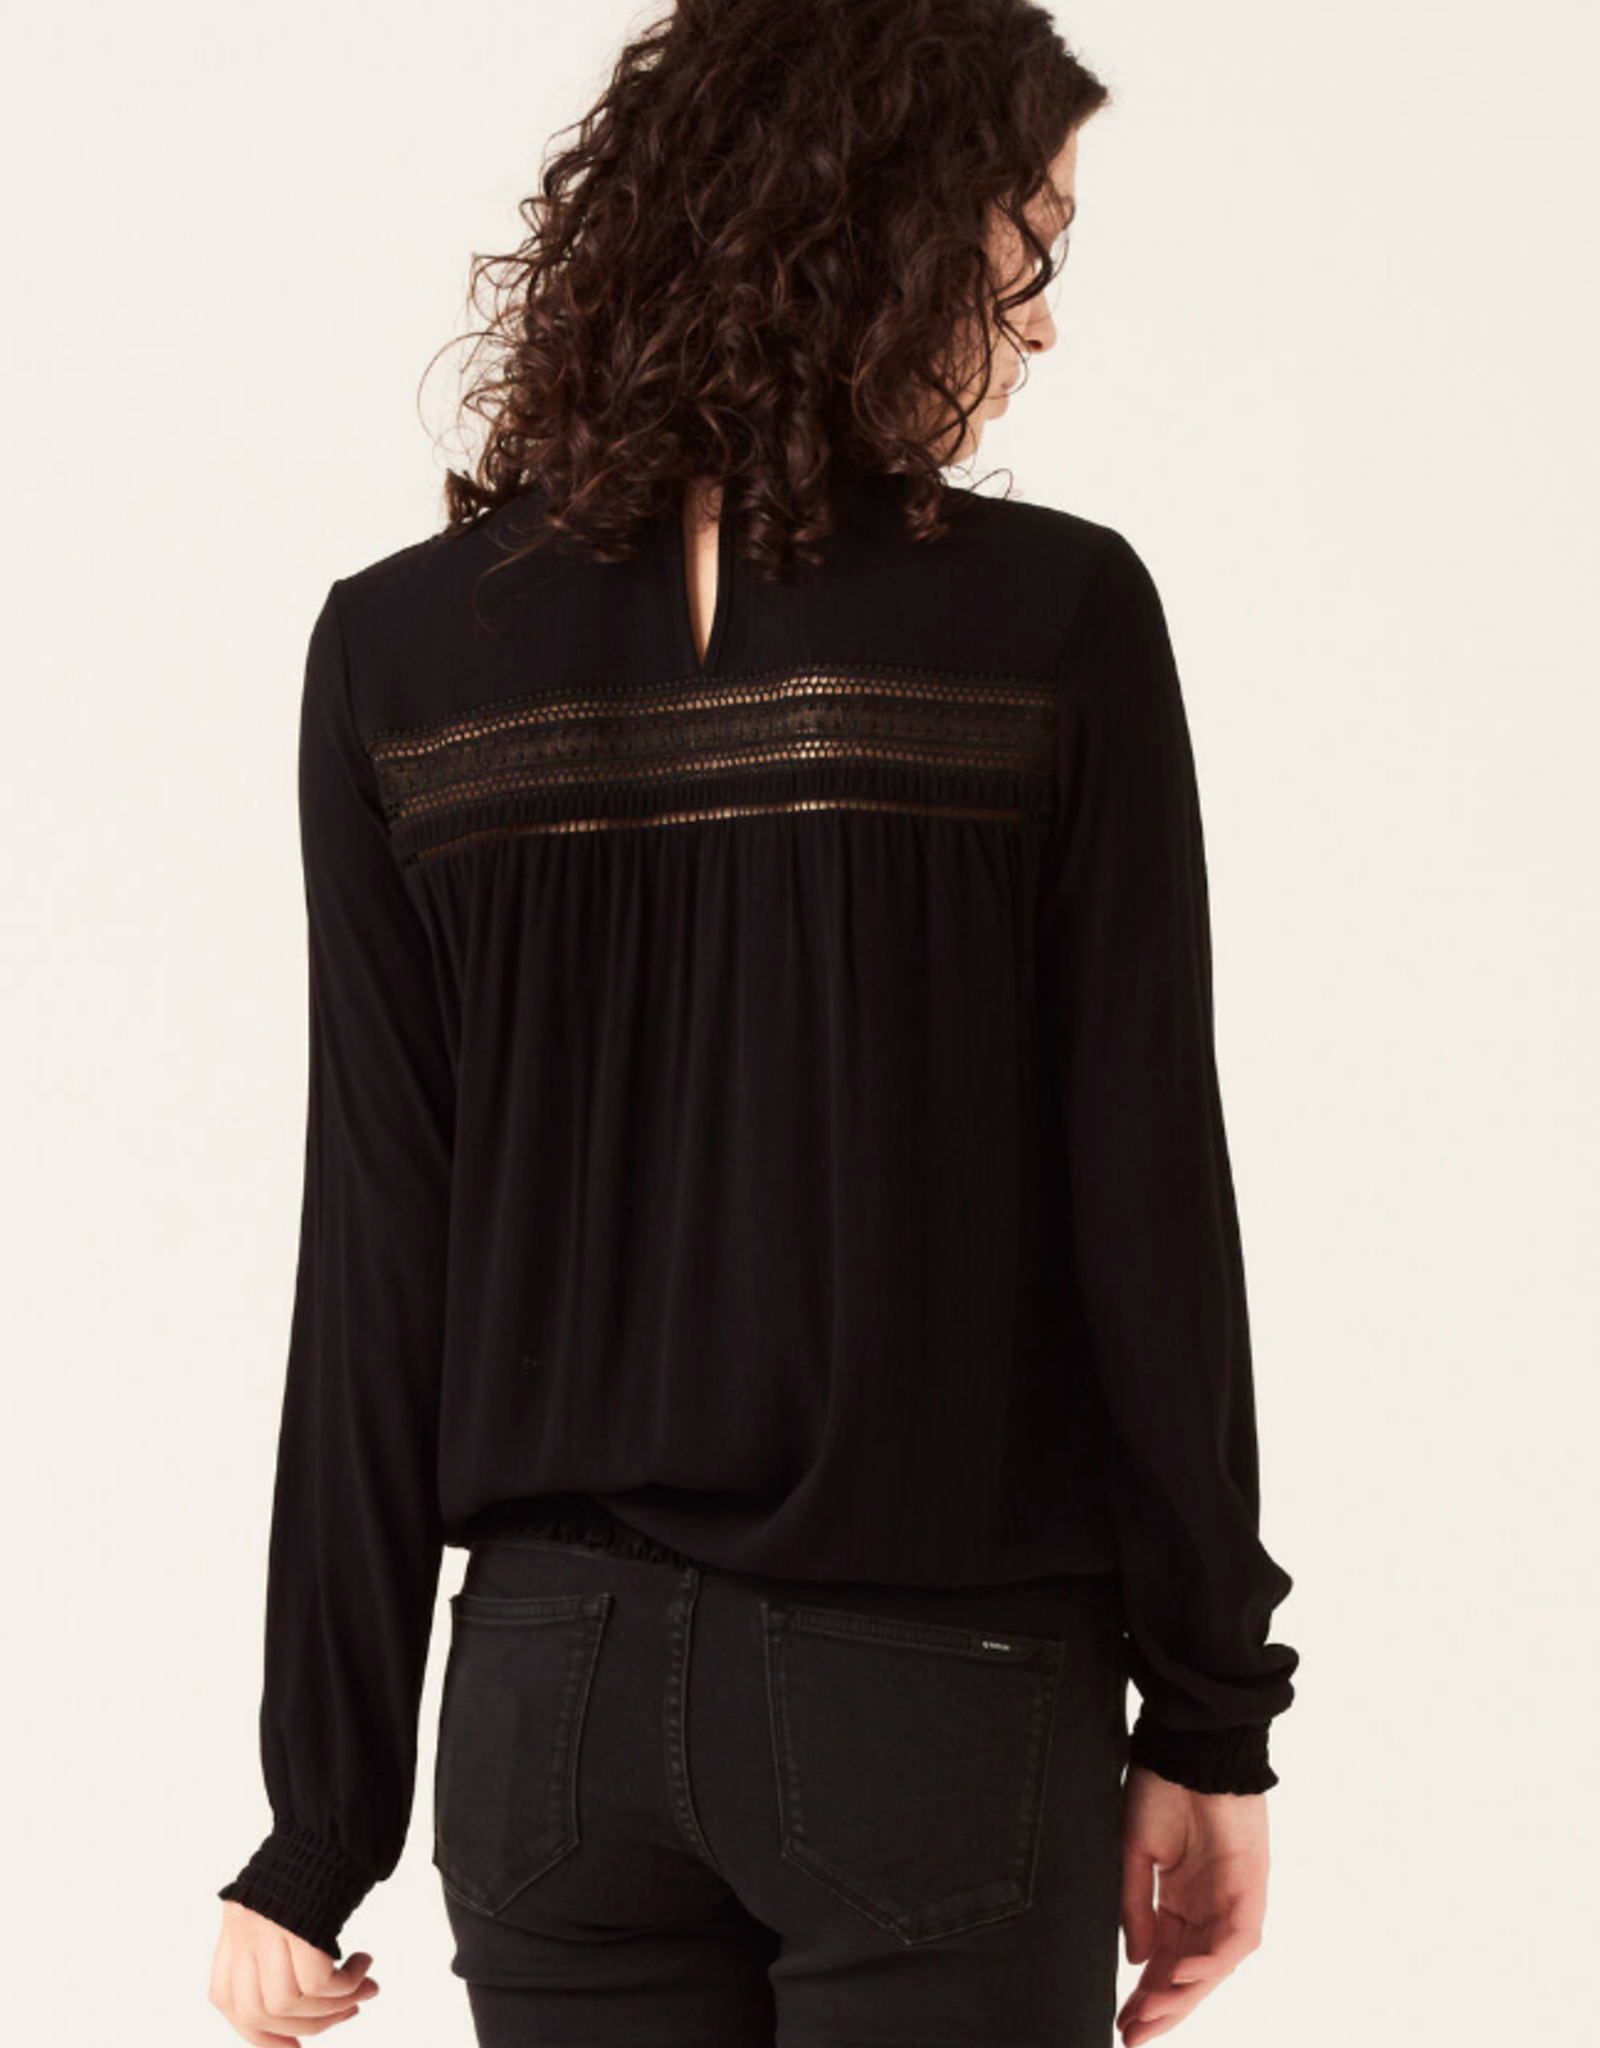 Garcia Garcia -  H10234 Shirt